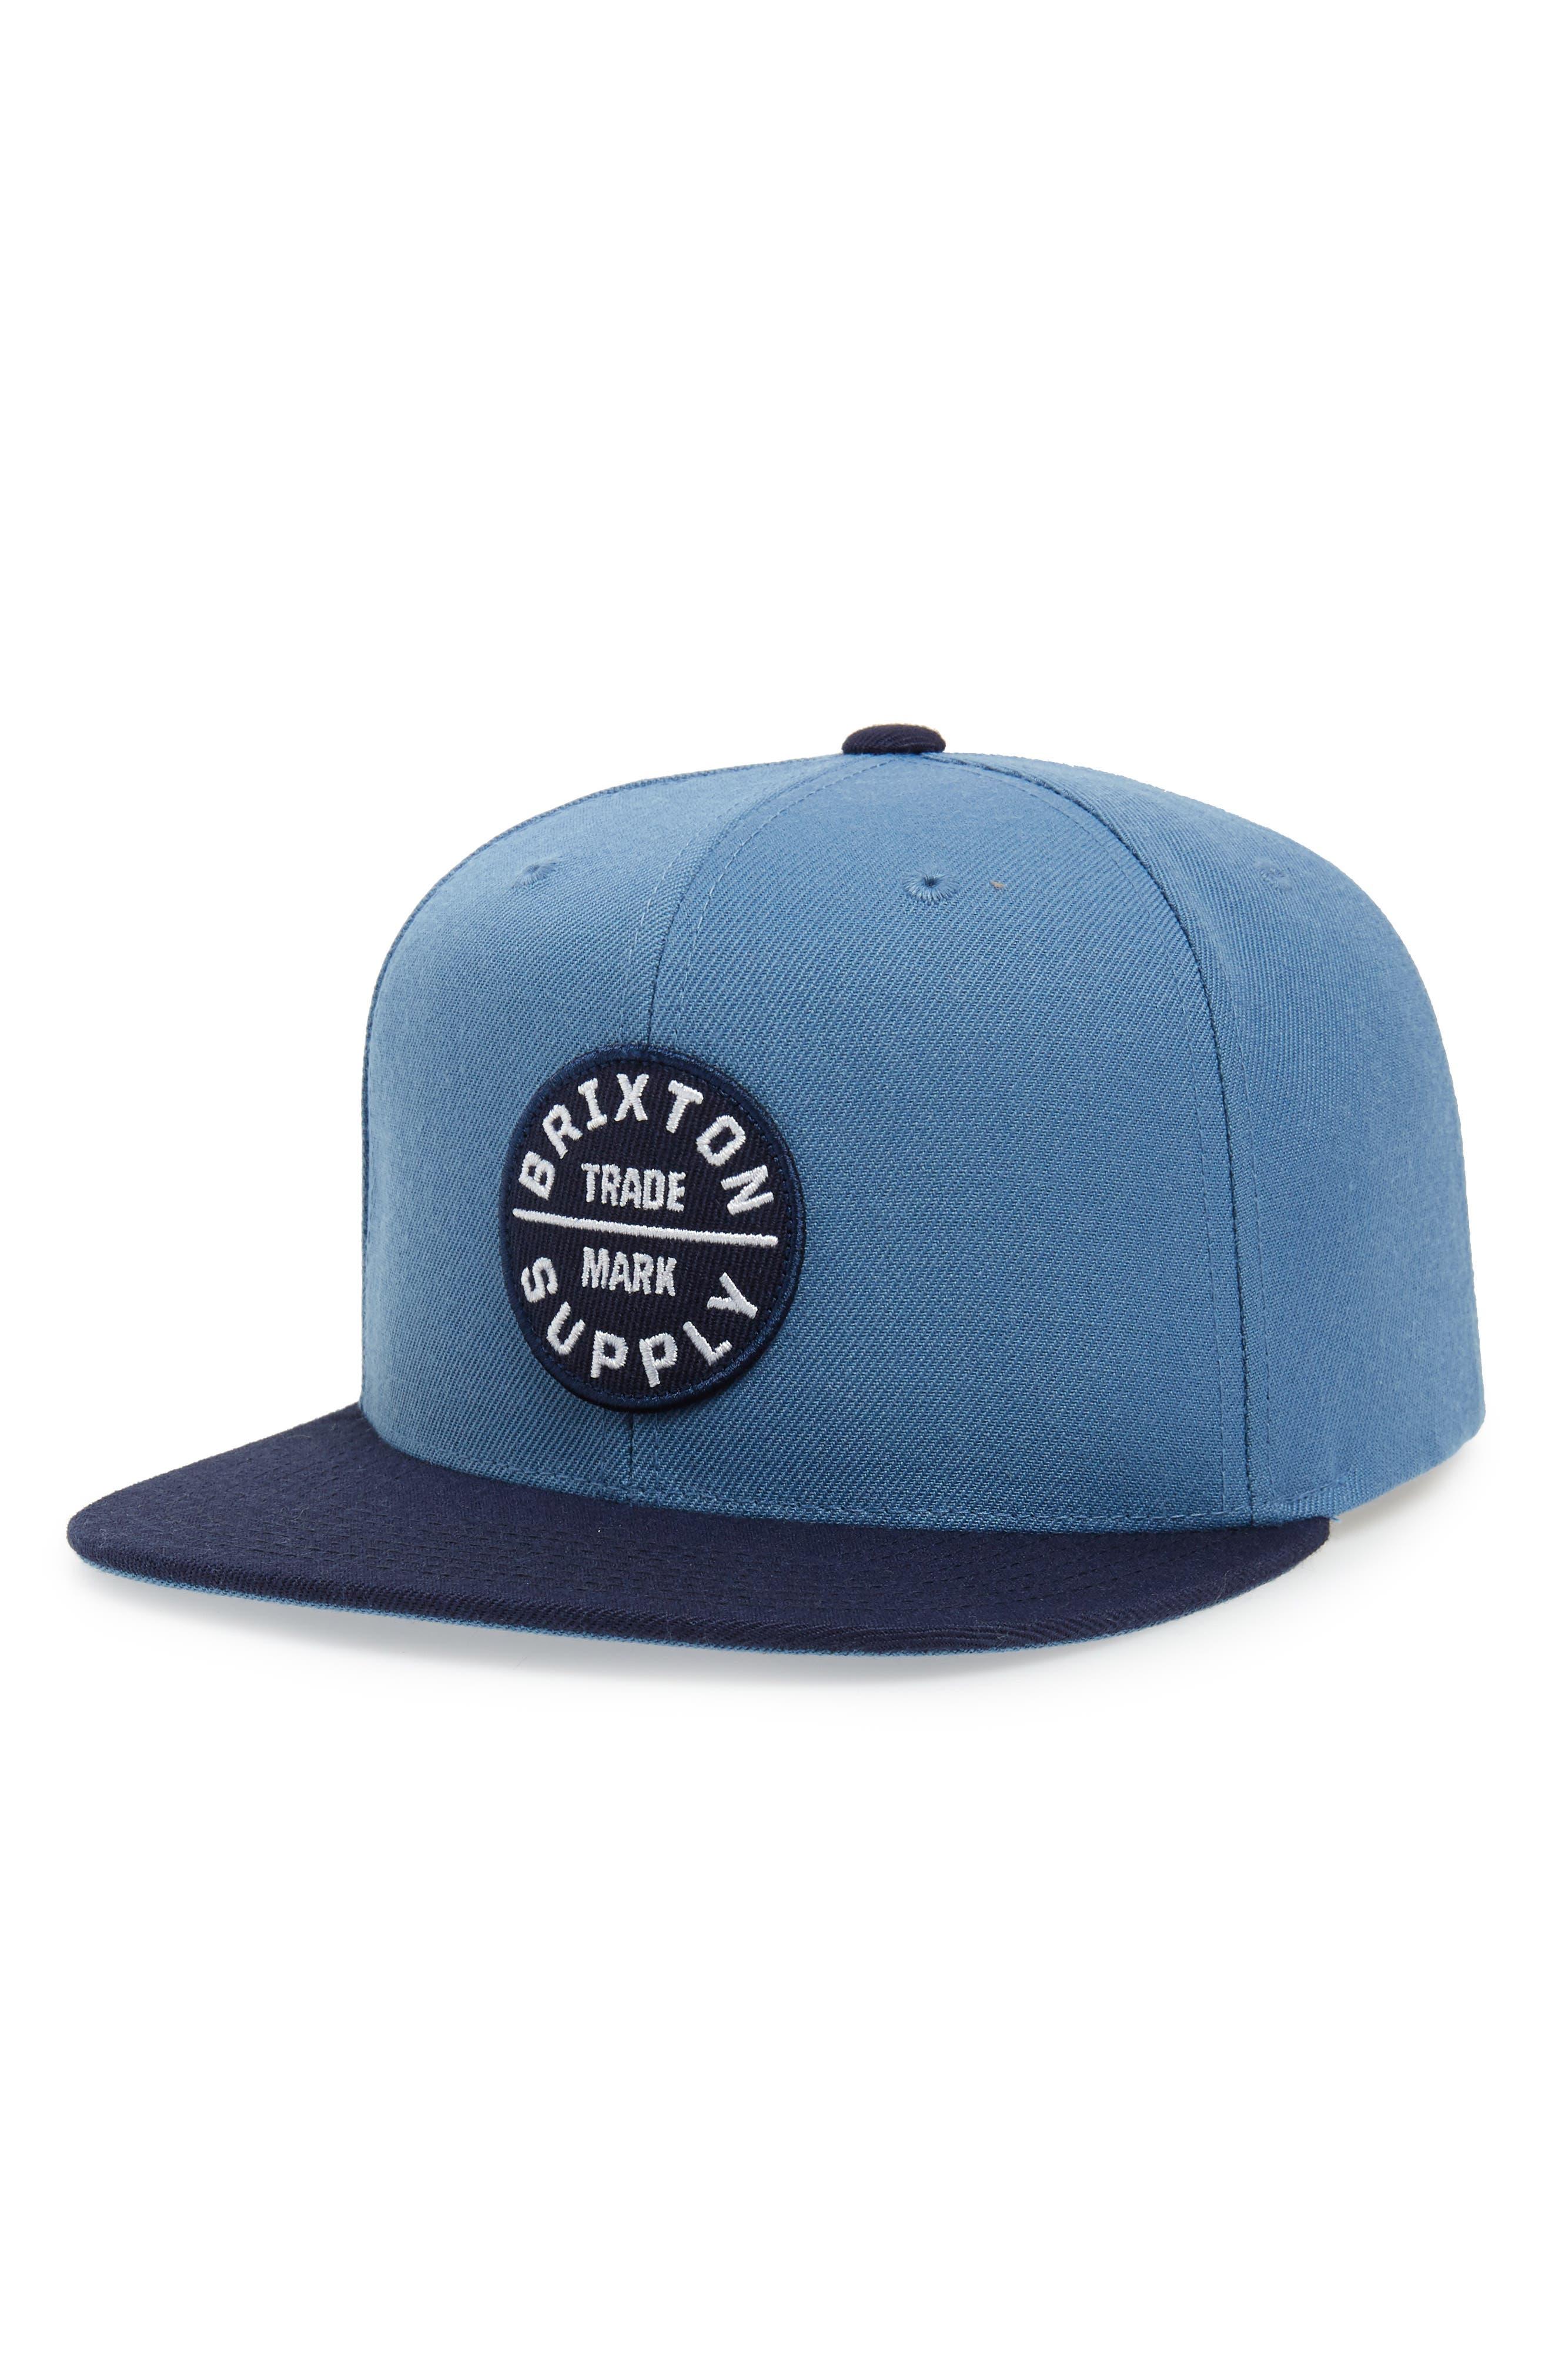 'Oath III' Snapback Cap, Main, color, GREY BLUE/ NAVY